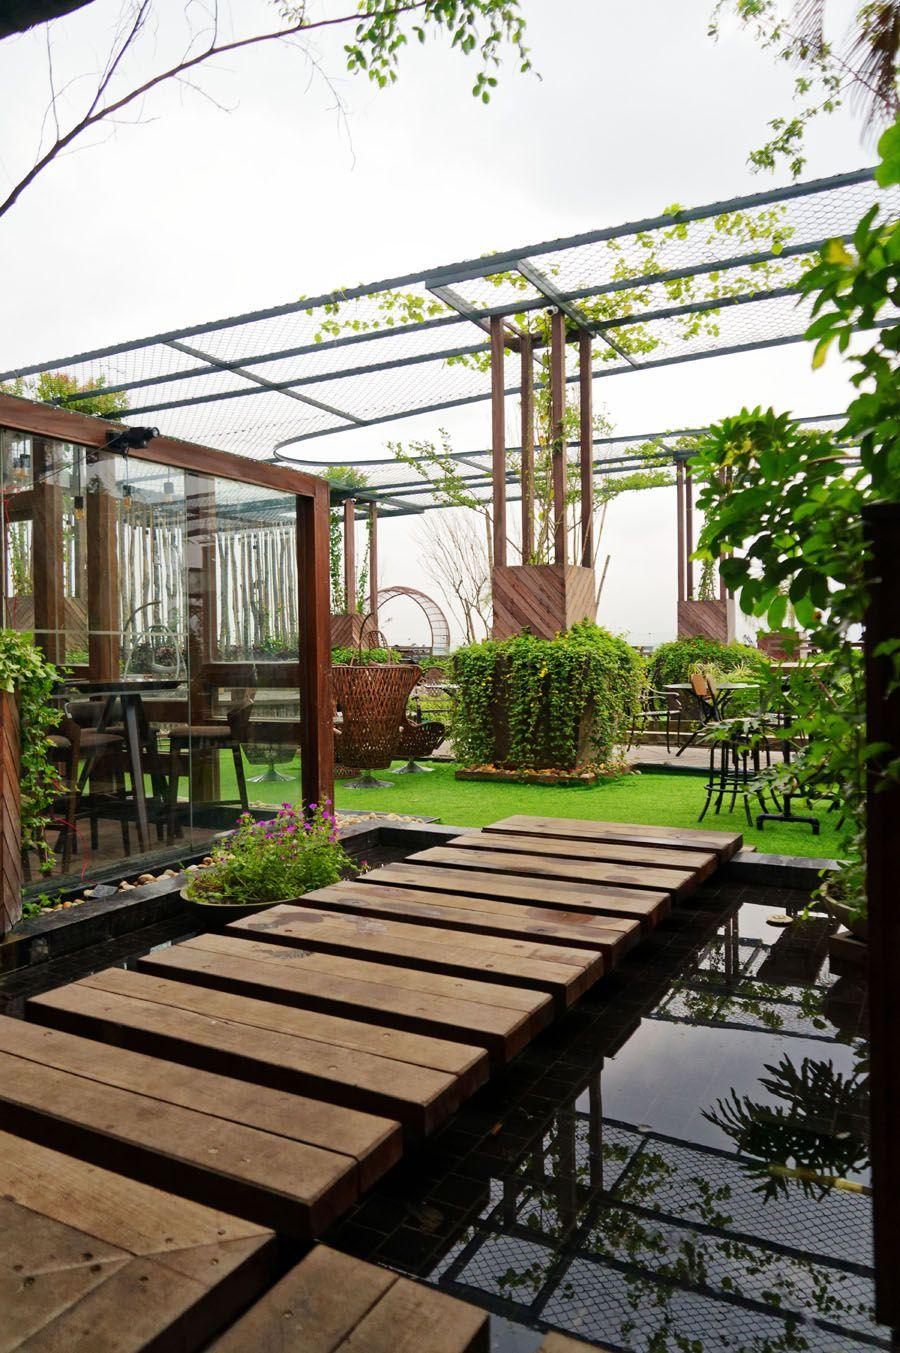 Green Lounge An Enchanted Sky Garden Green lounge, Sky